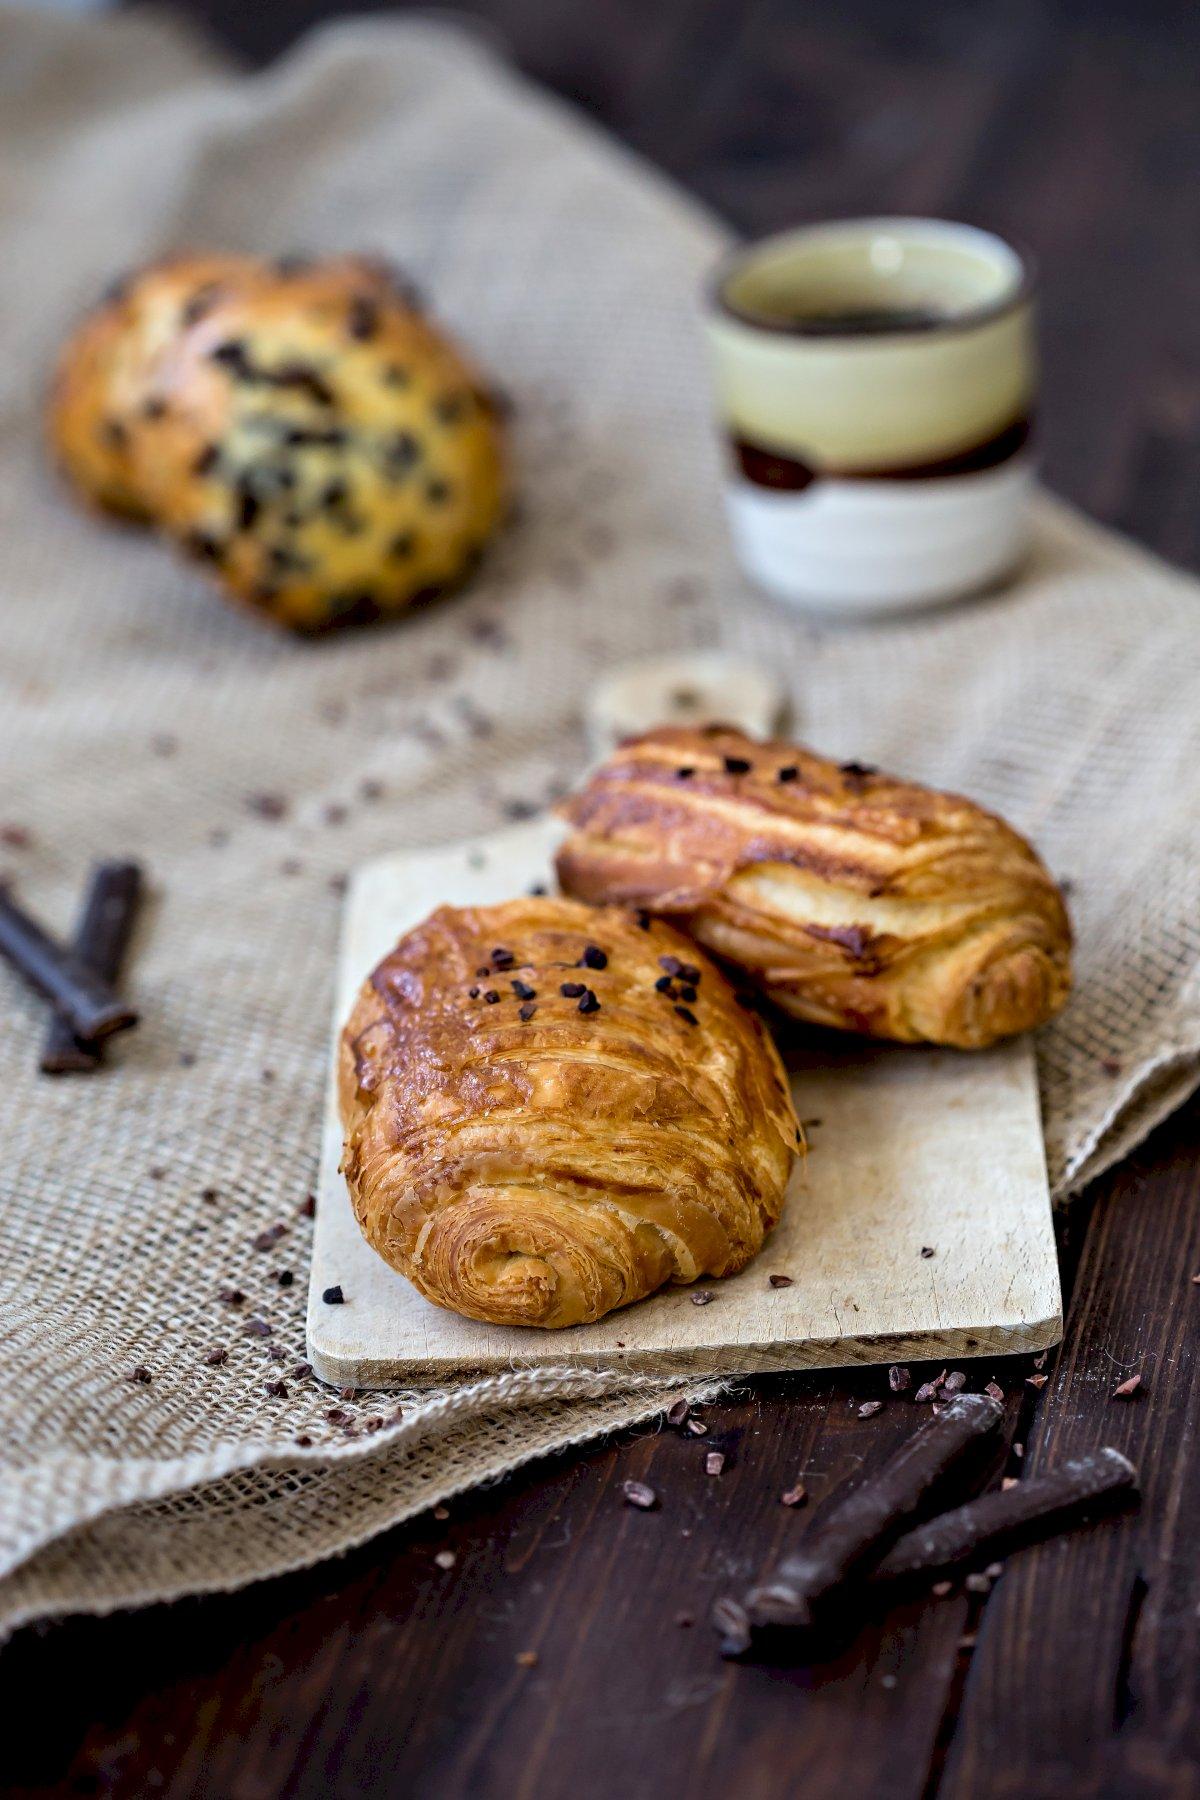 Fiche Boulangerie Maison Pozzoli - MOF 69007